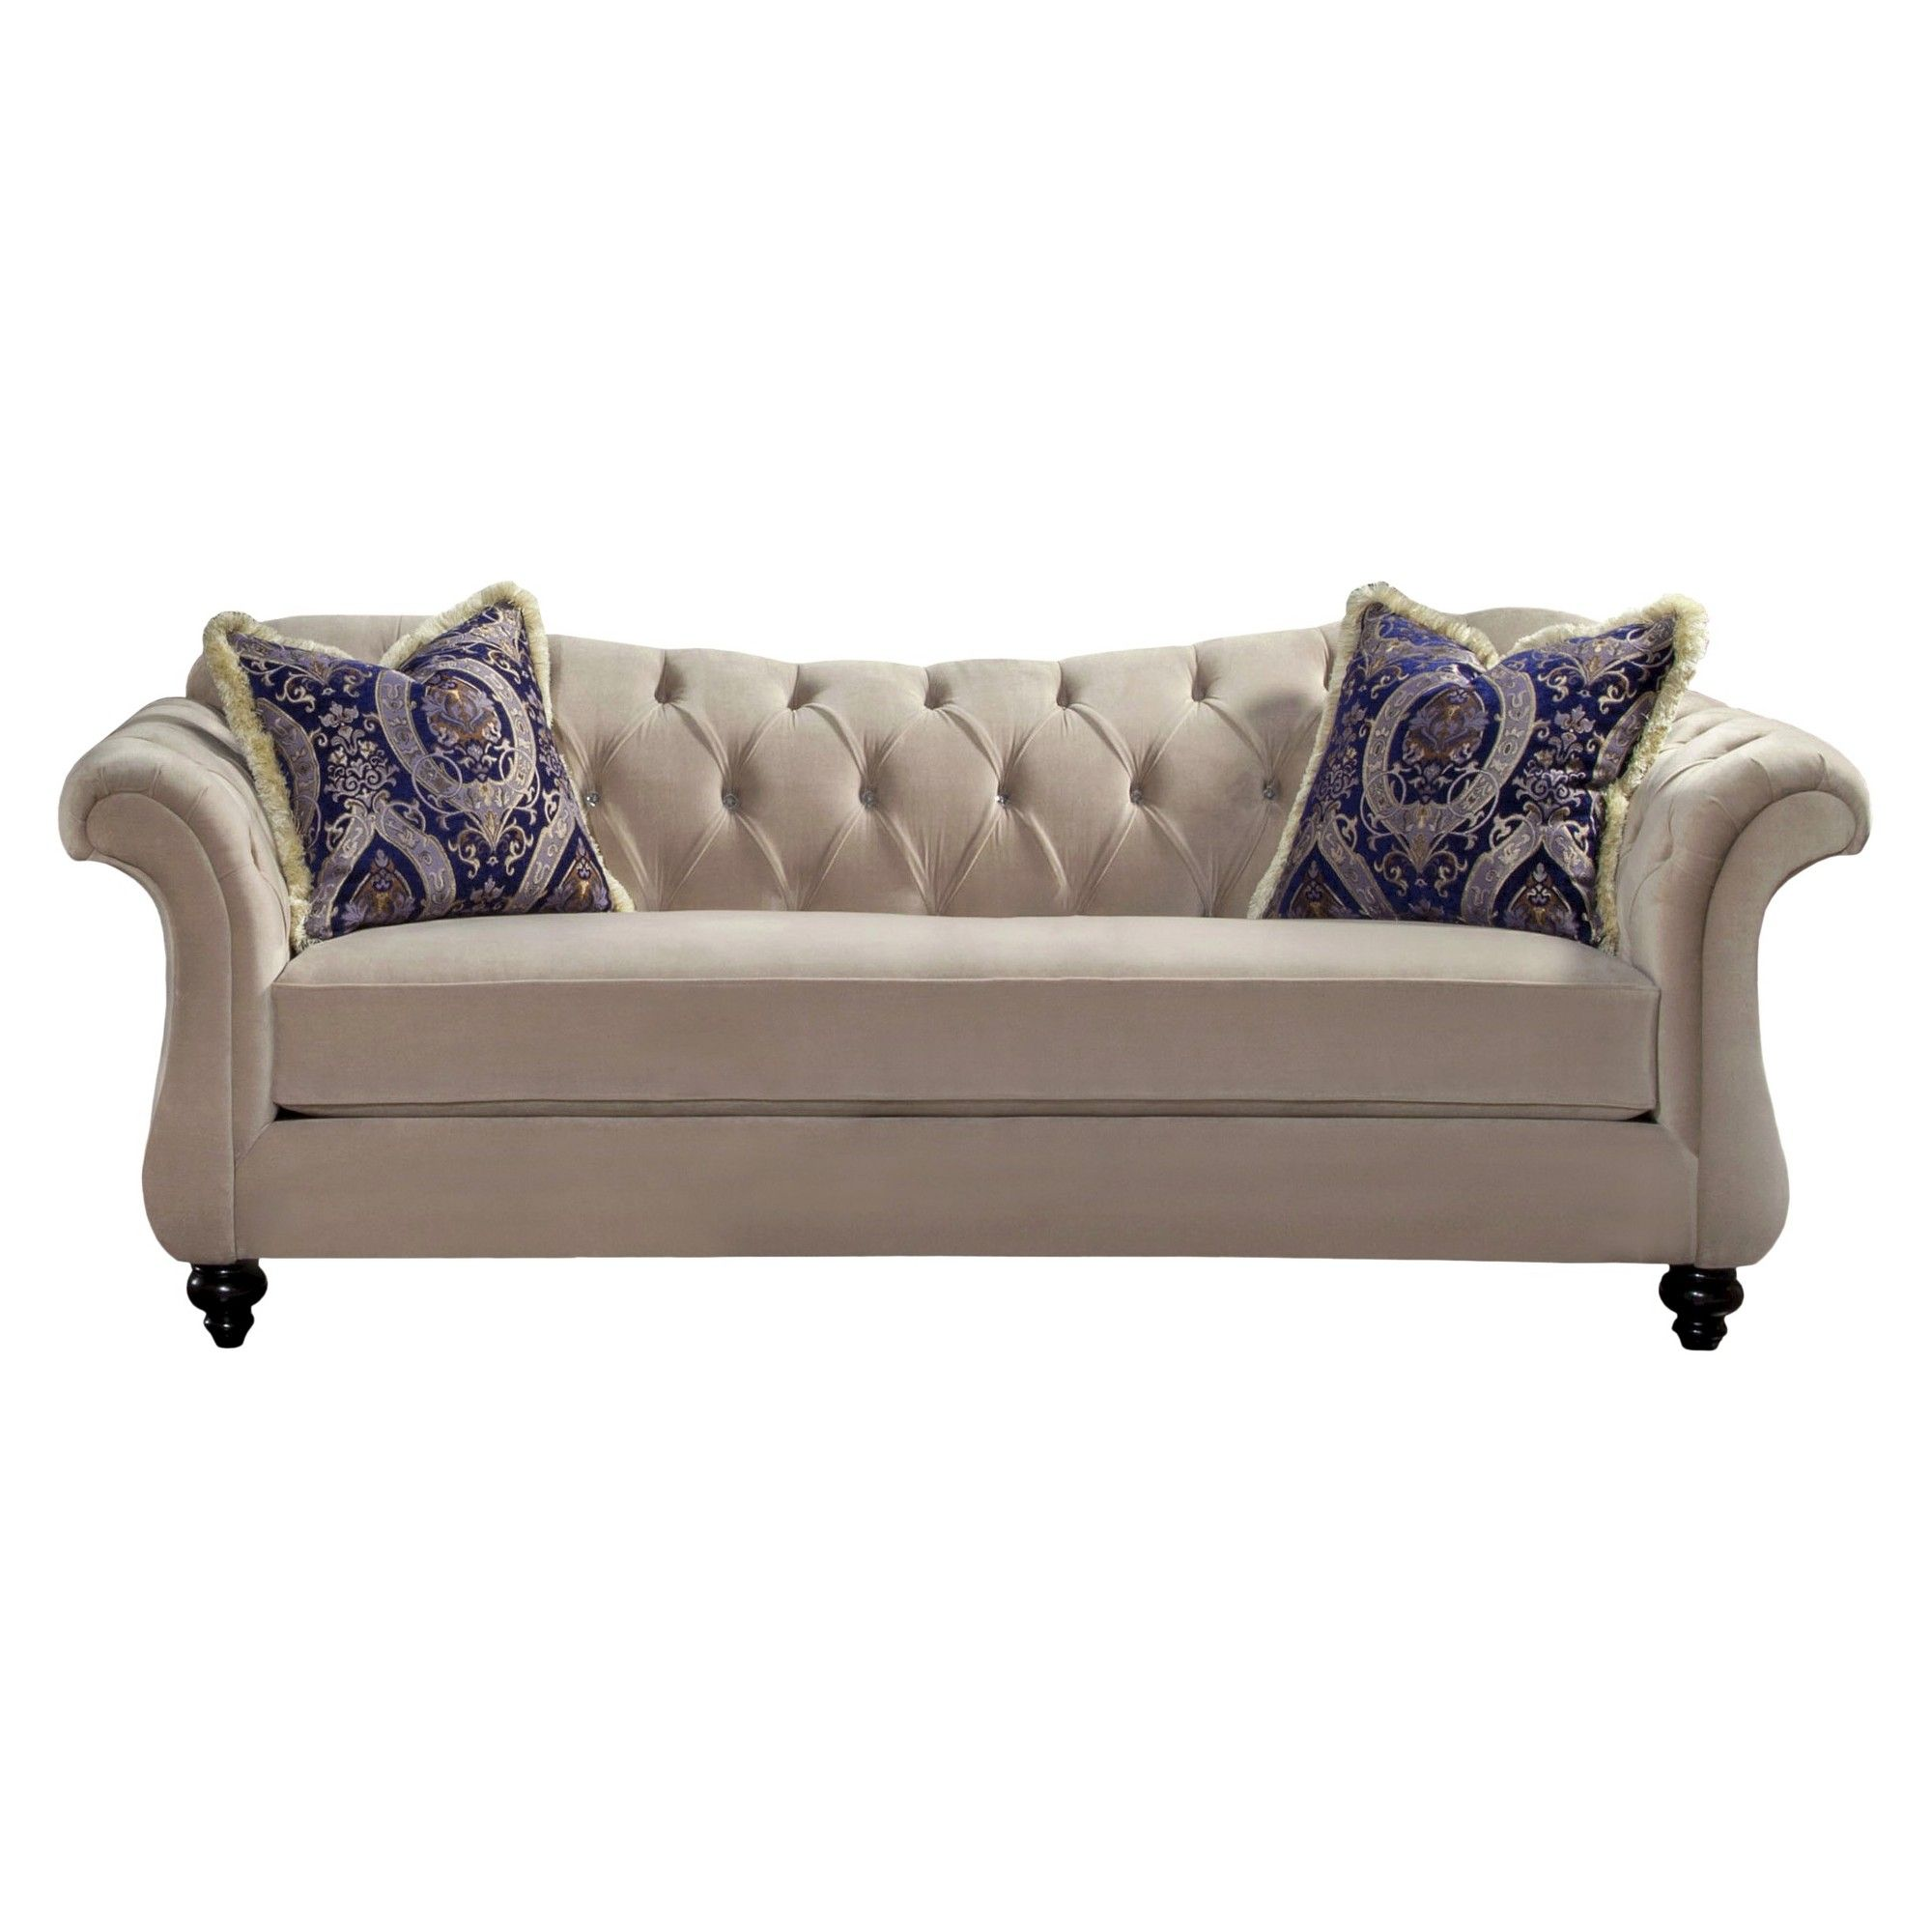 Iohomes alexandria victorian style sofa in beige